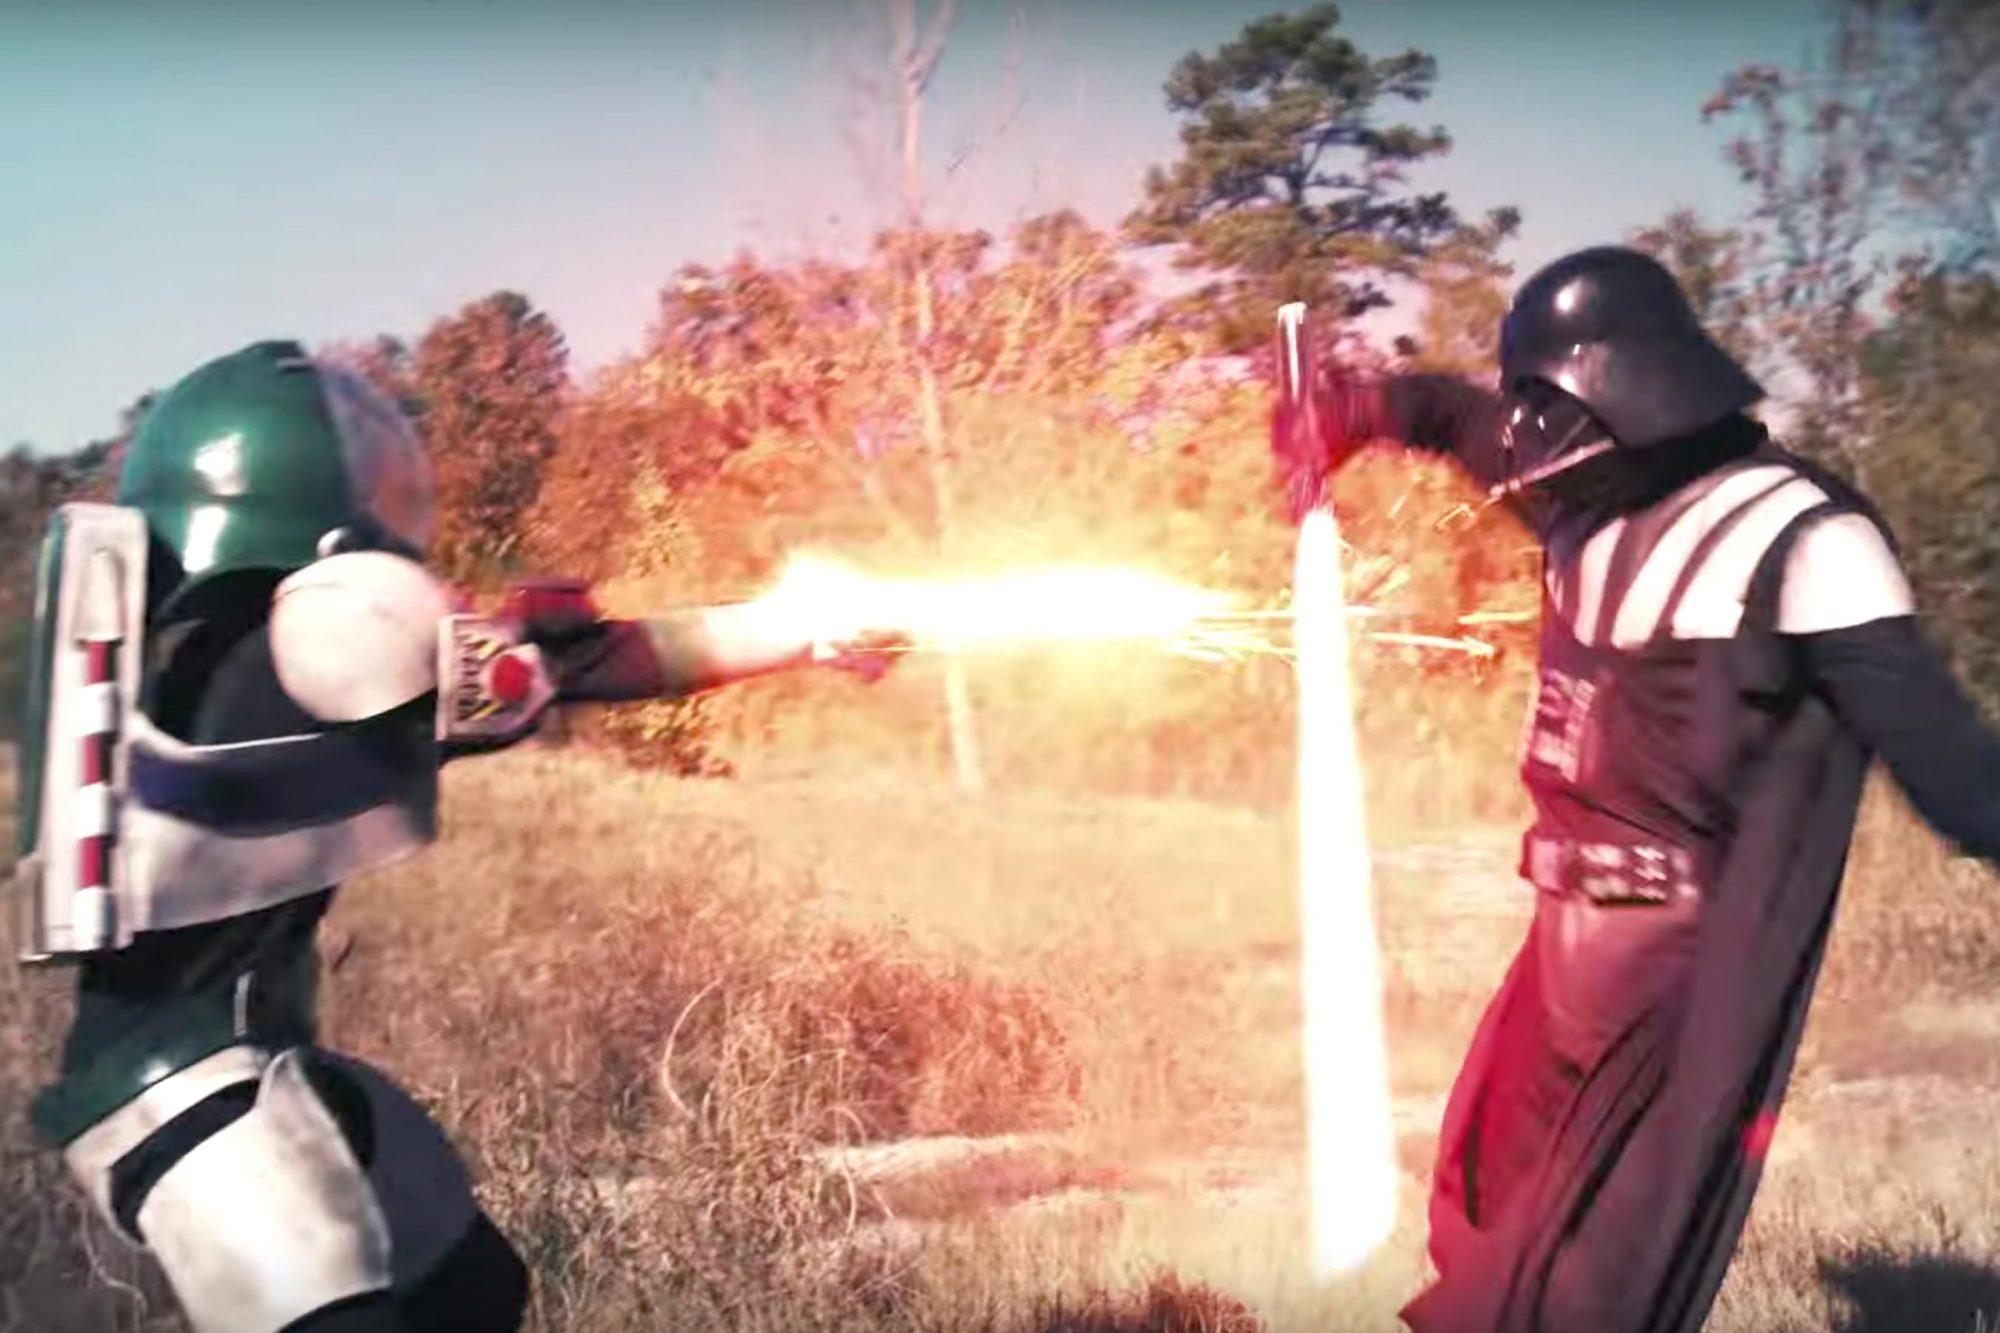 Darth Vader VS Buzz Lightyear Youtube video (screen grab) CR: Nukazooka